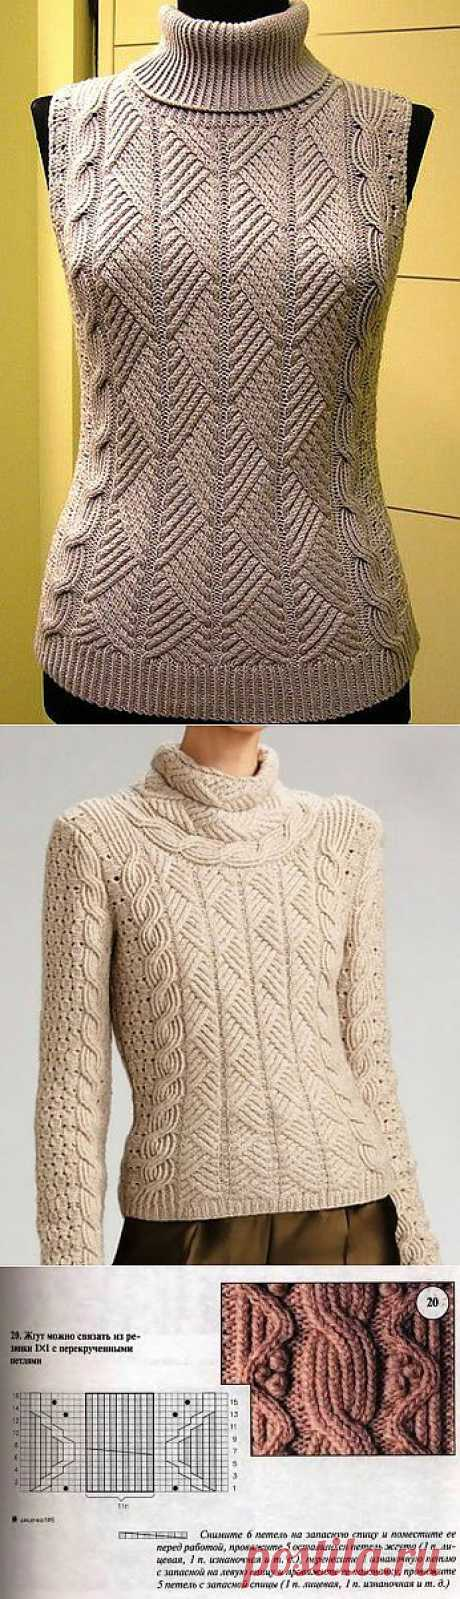 Жилет и свитер одинаковым узором..